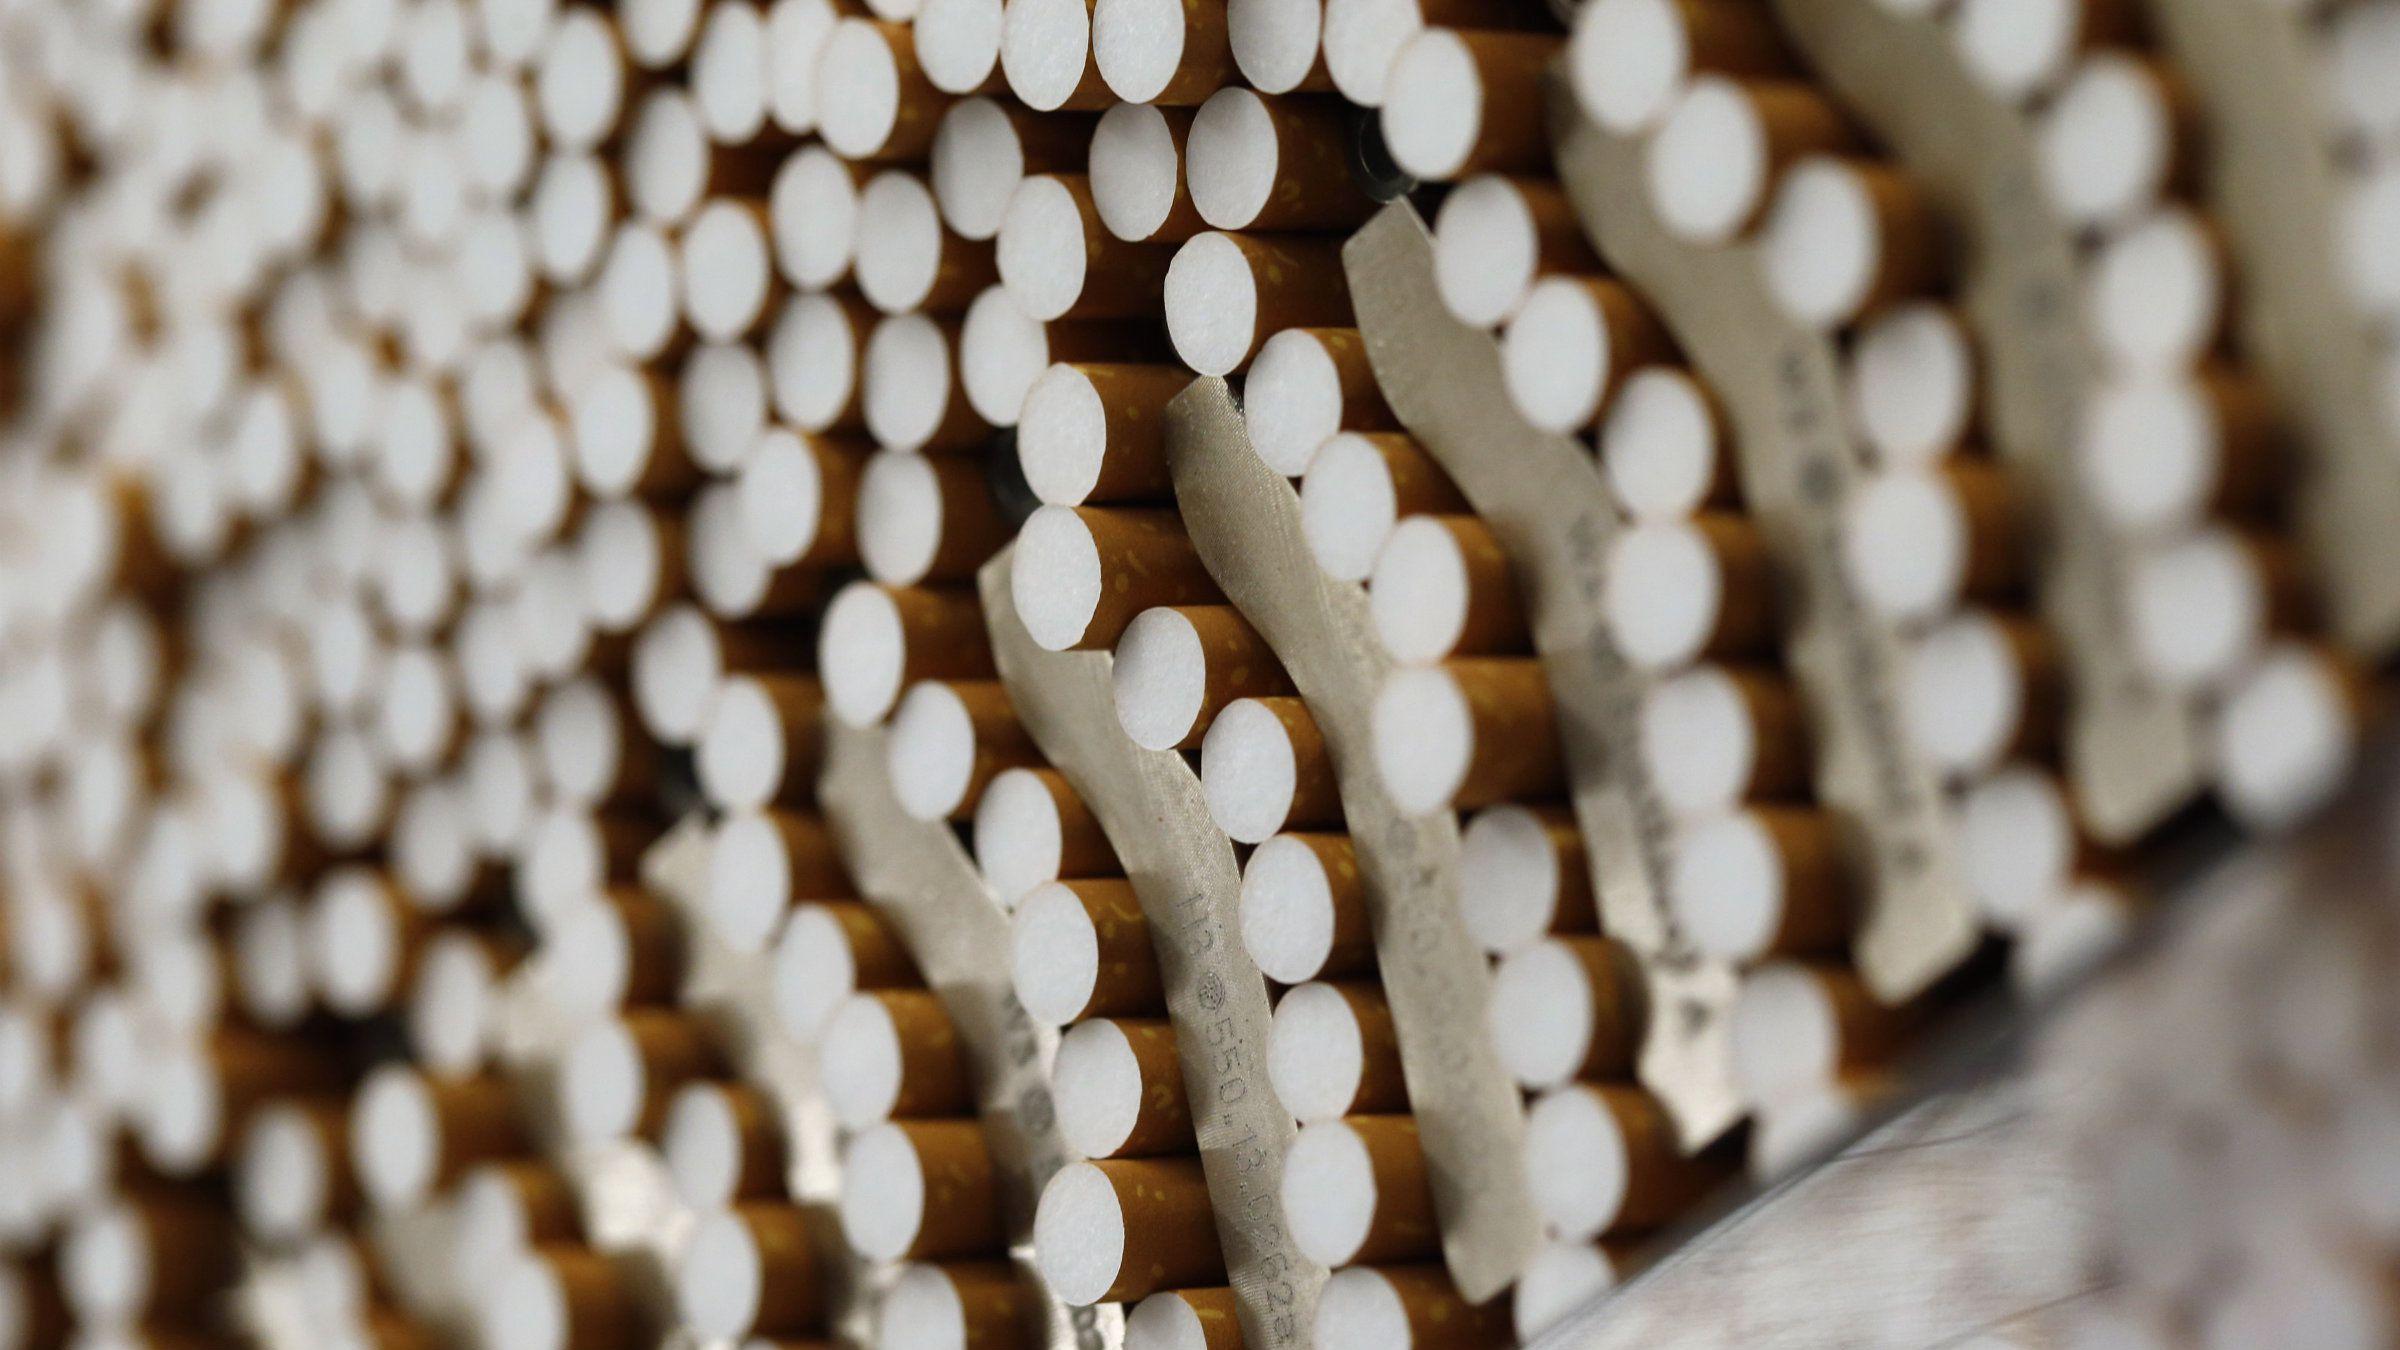 Big Tobacco Mergers e-cigarettes Reynolds